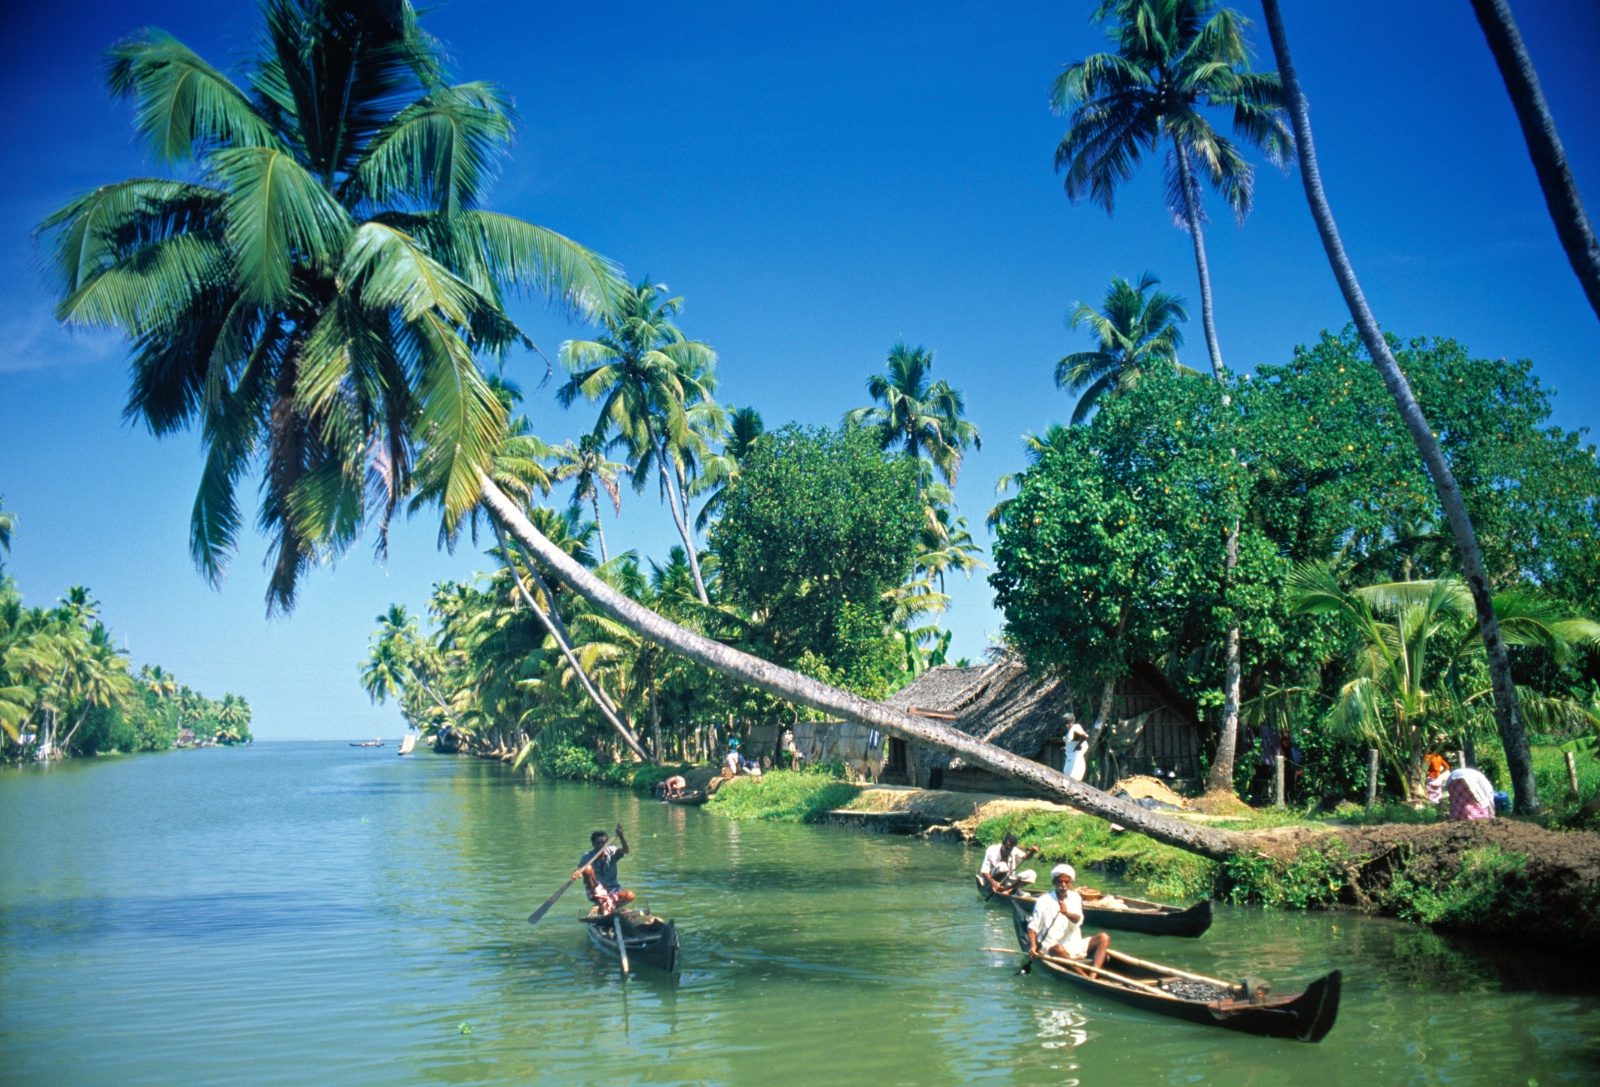 India - Magiske Kerala - gudenes hage